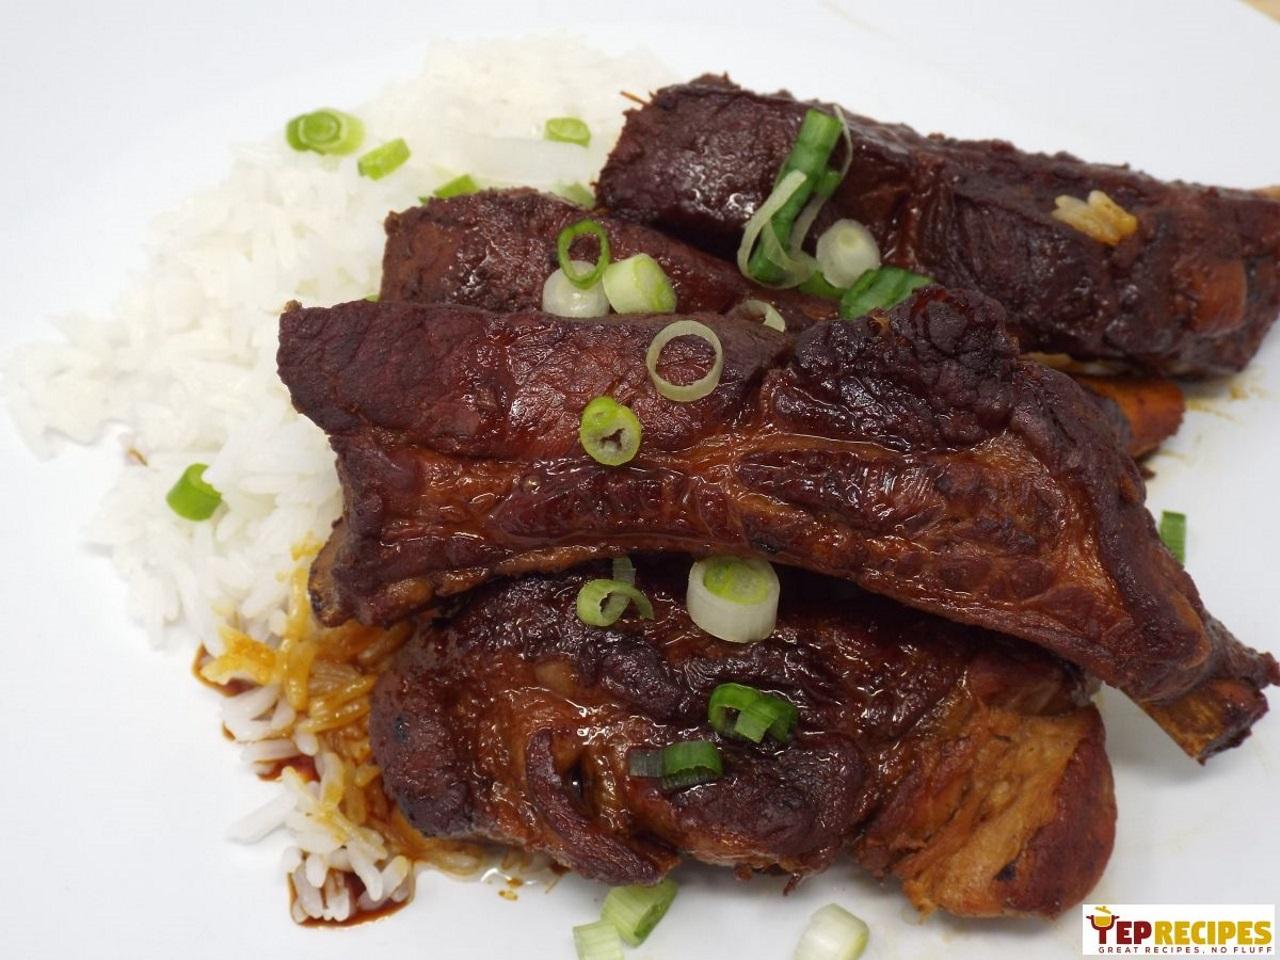 Japanese-Style Braised Pork Ribs